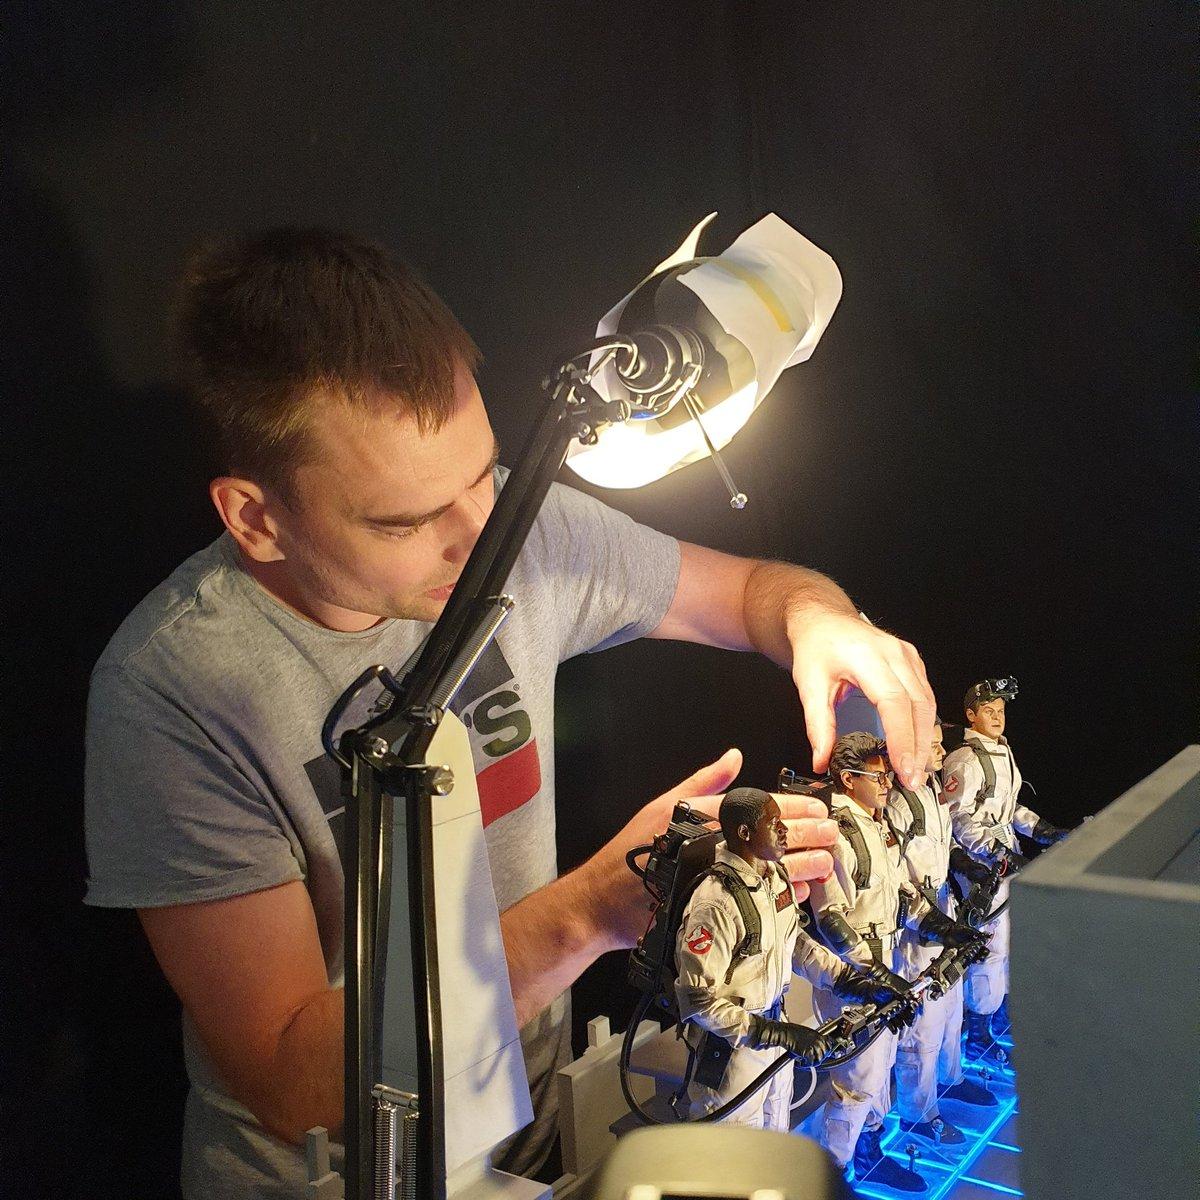 Stop Motion Dreharbeiten 🎬📽  Ghostbusters Der Stop Motion Fan Film   #ghostbusters #blizway #dreharbeiten #stopmotion https://t.co/LAcKDsYizr